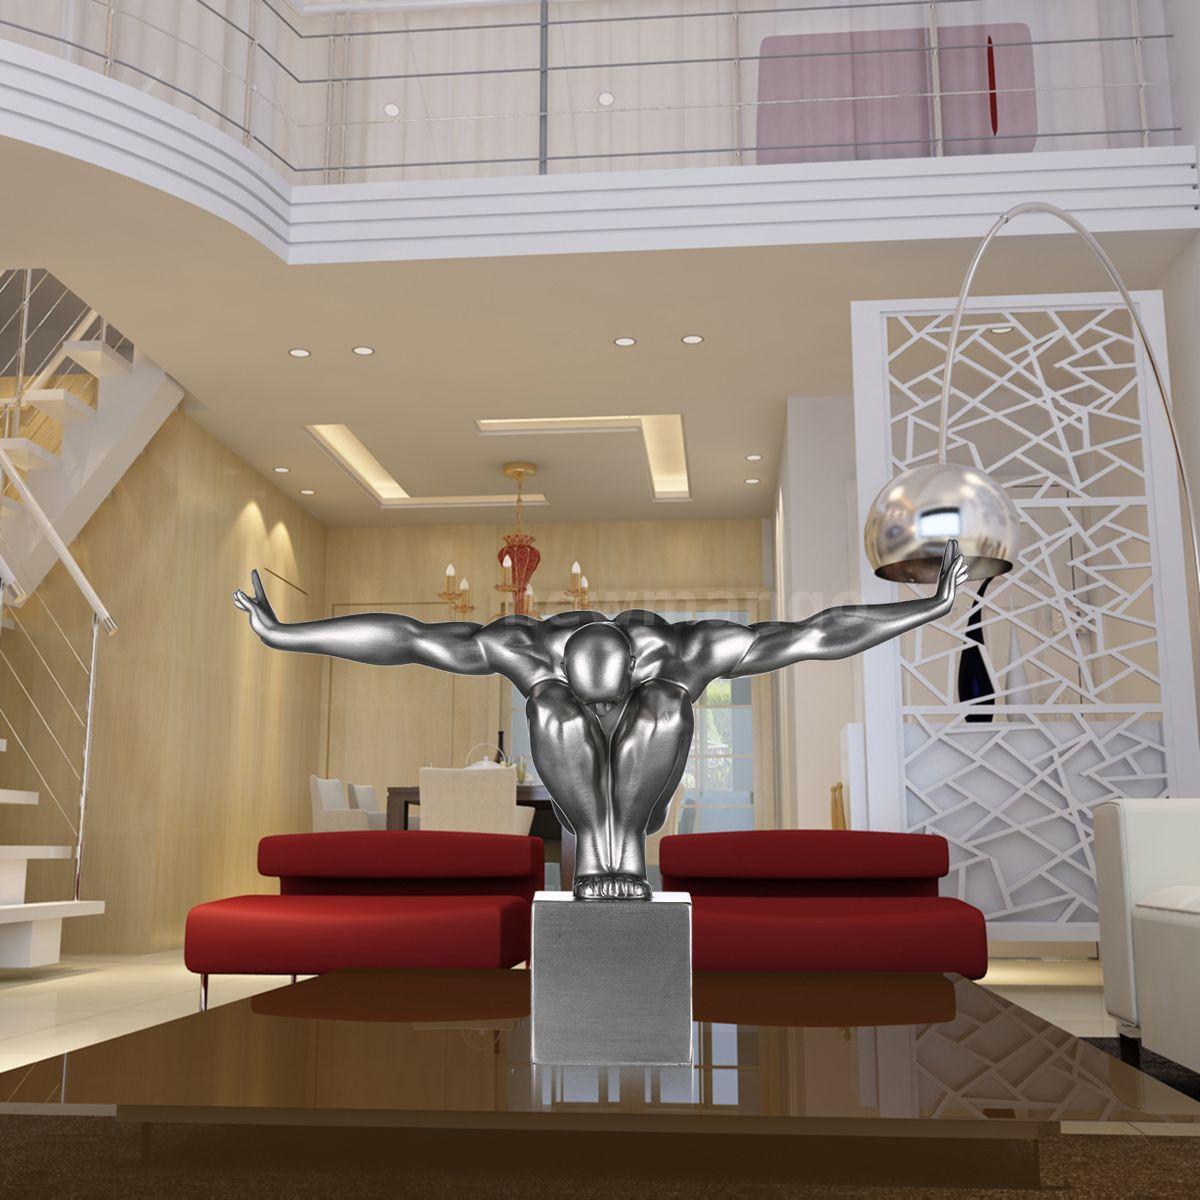 Gifts tooarts diver fiberglass modern sculpture home decor for Modern home decor gifts